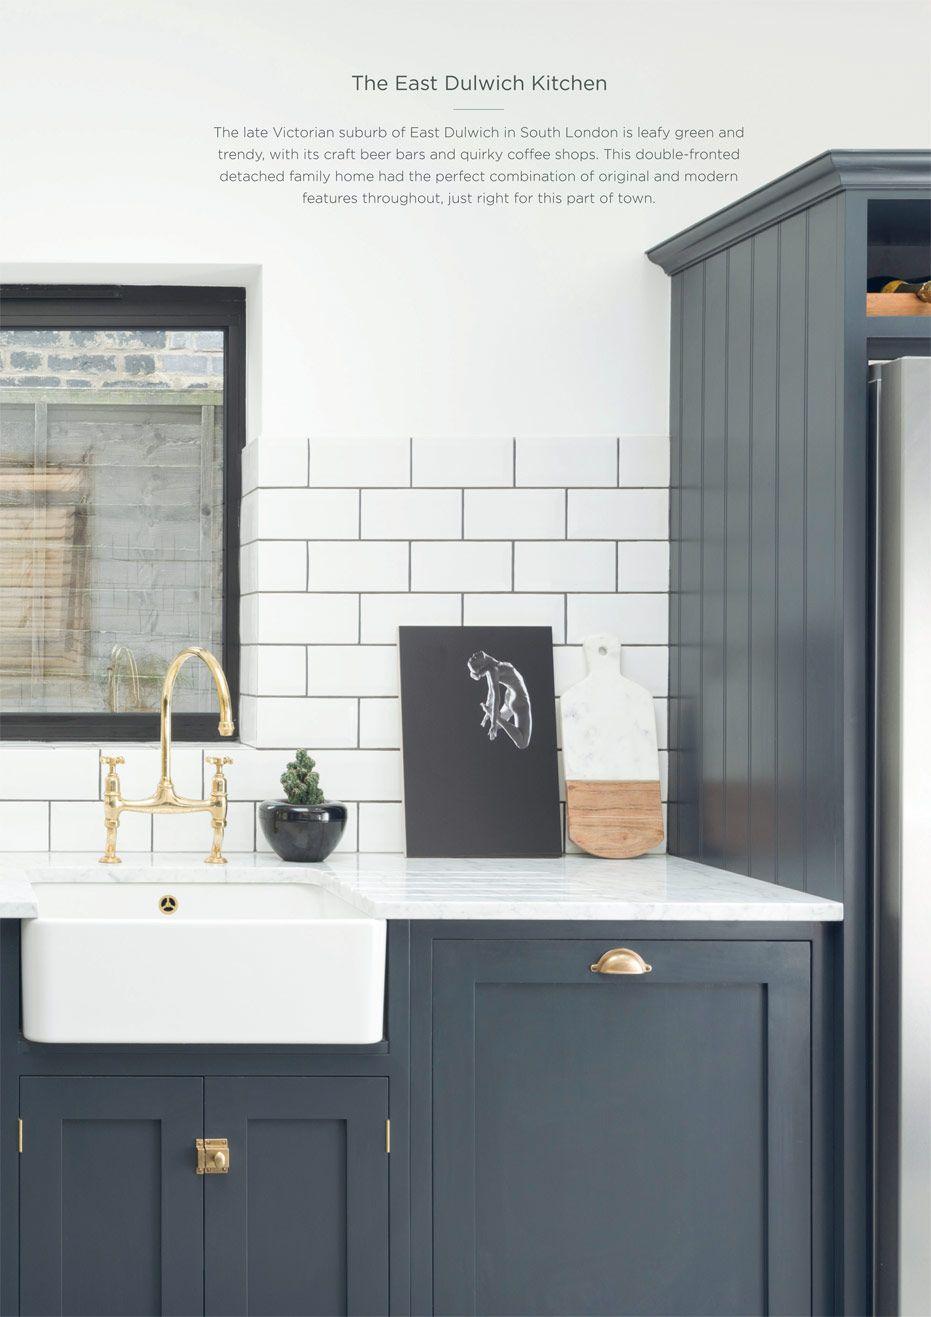 Shaker Kitchen Brochure | deVOL Kitchens | Lodowki | Pinterest ...